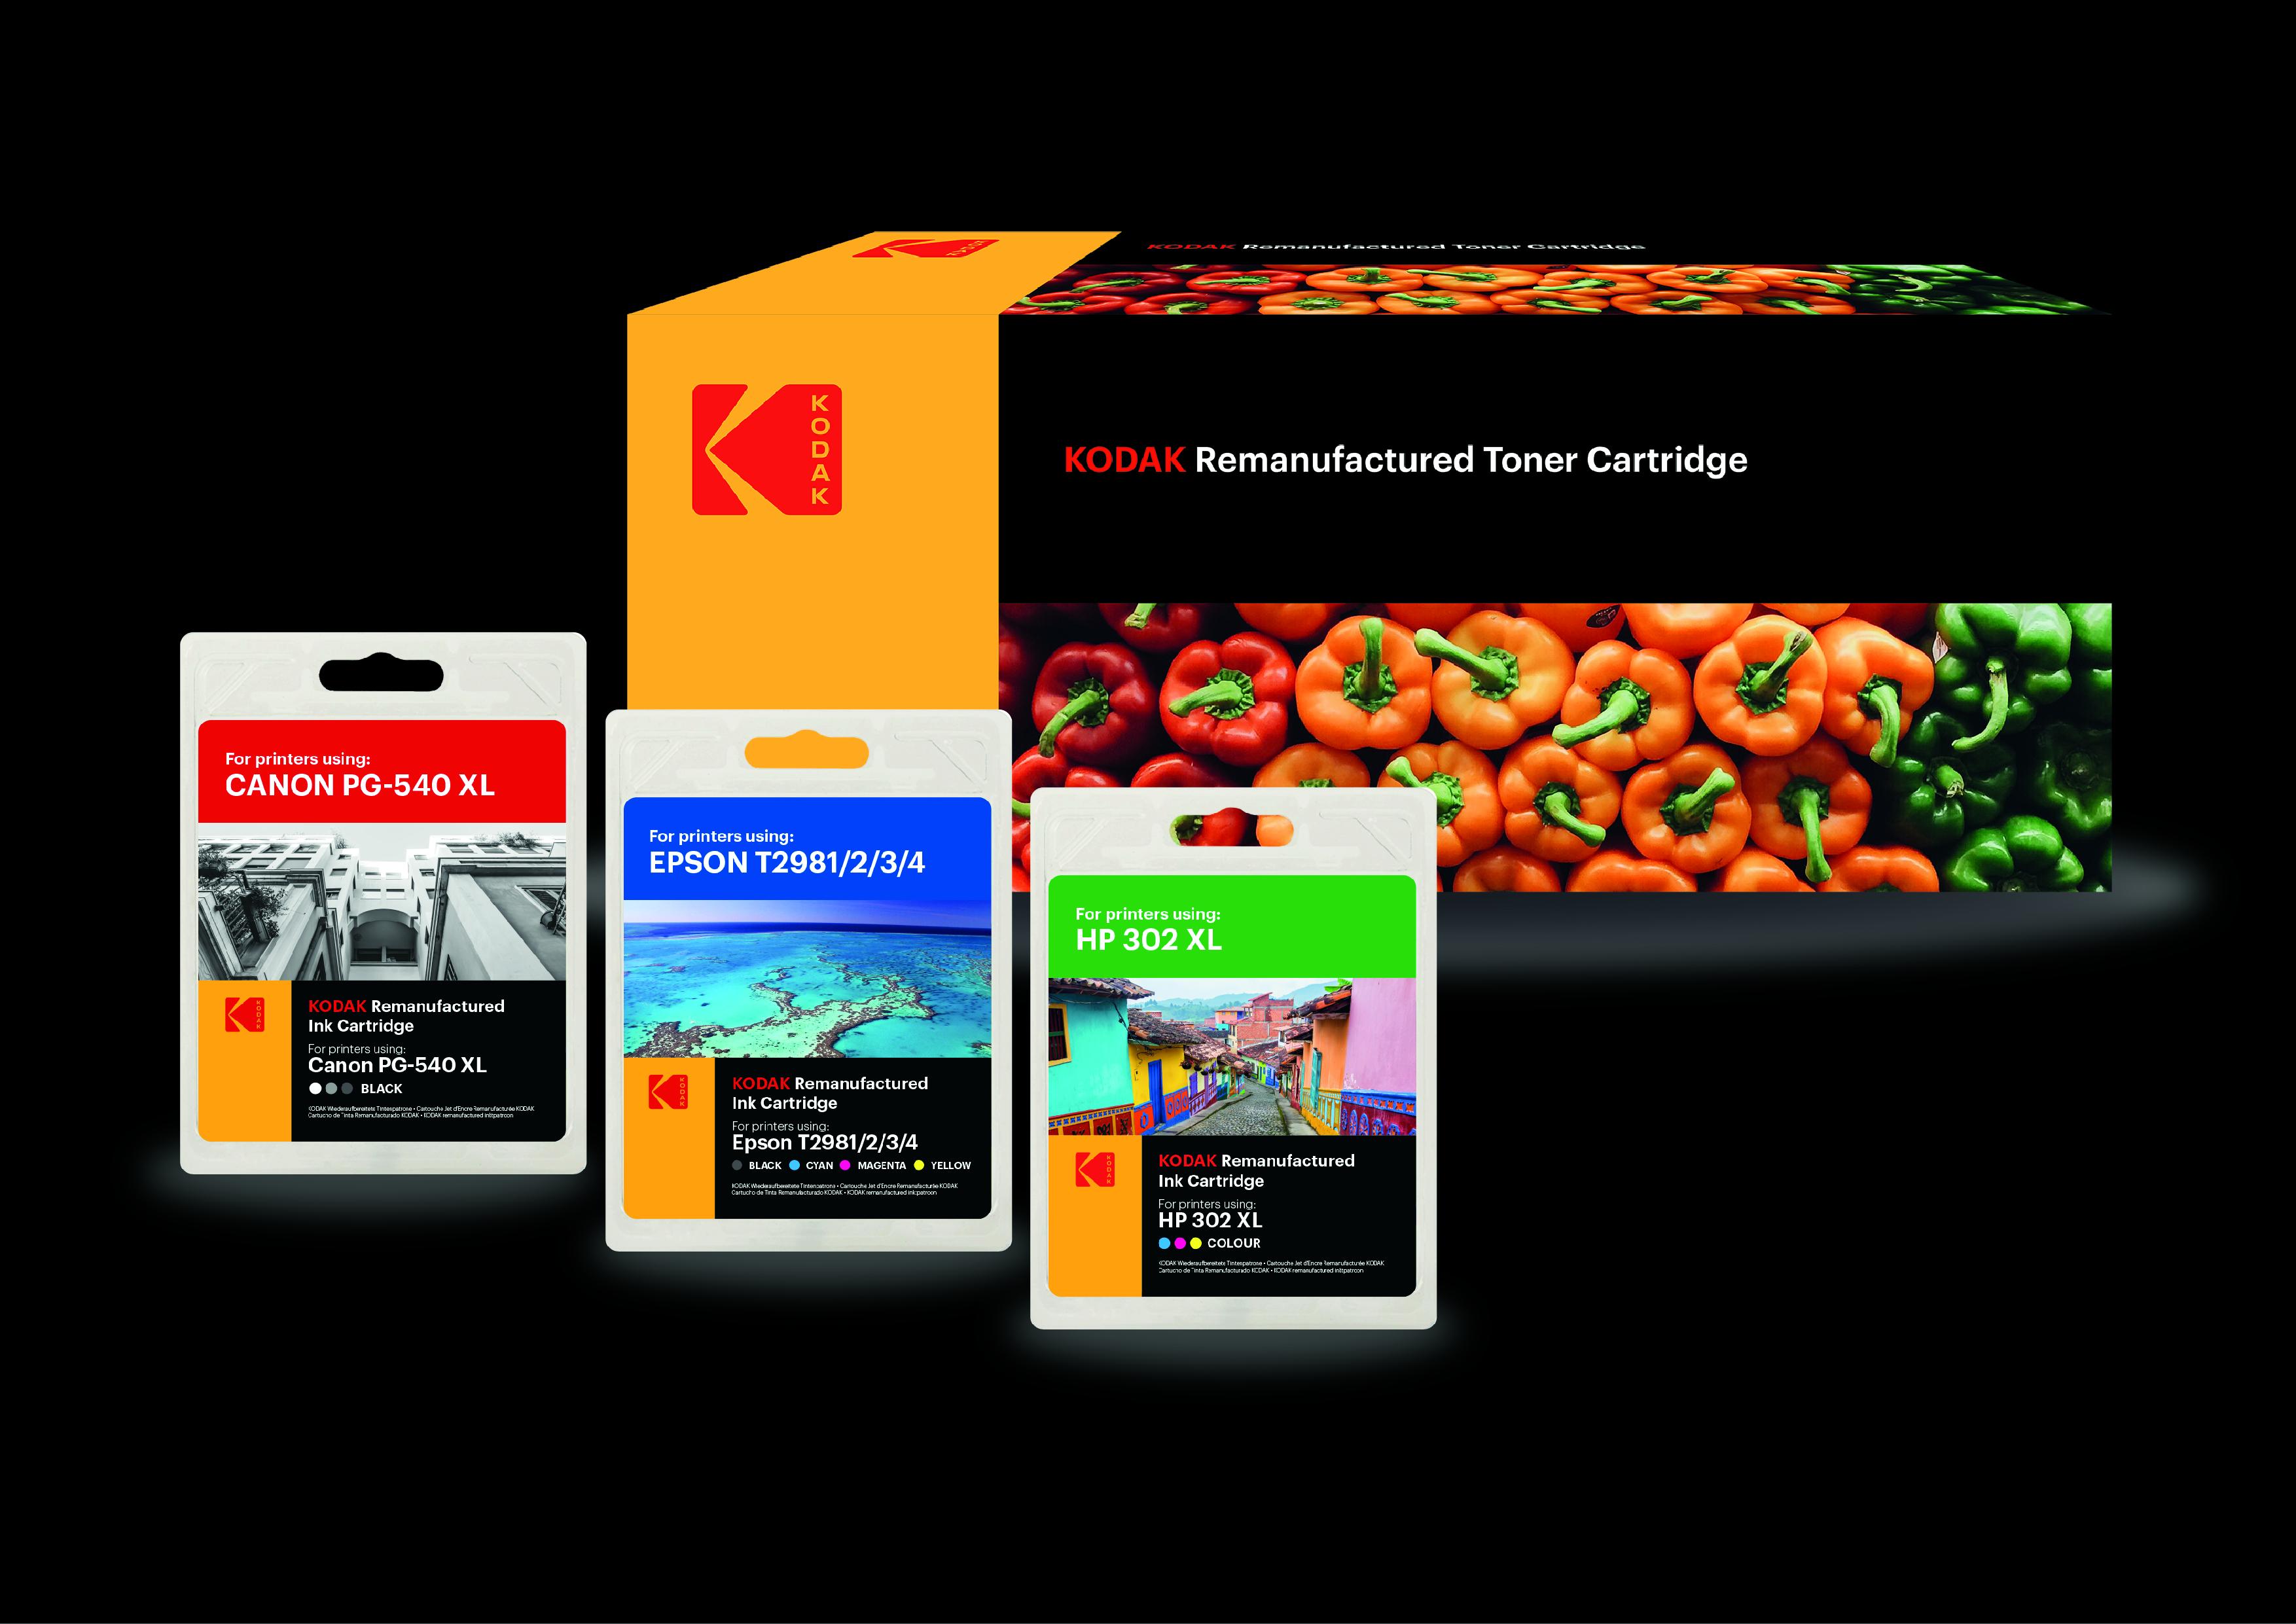 DCi signs partnership with Kodak